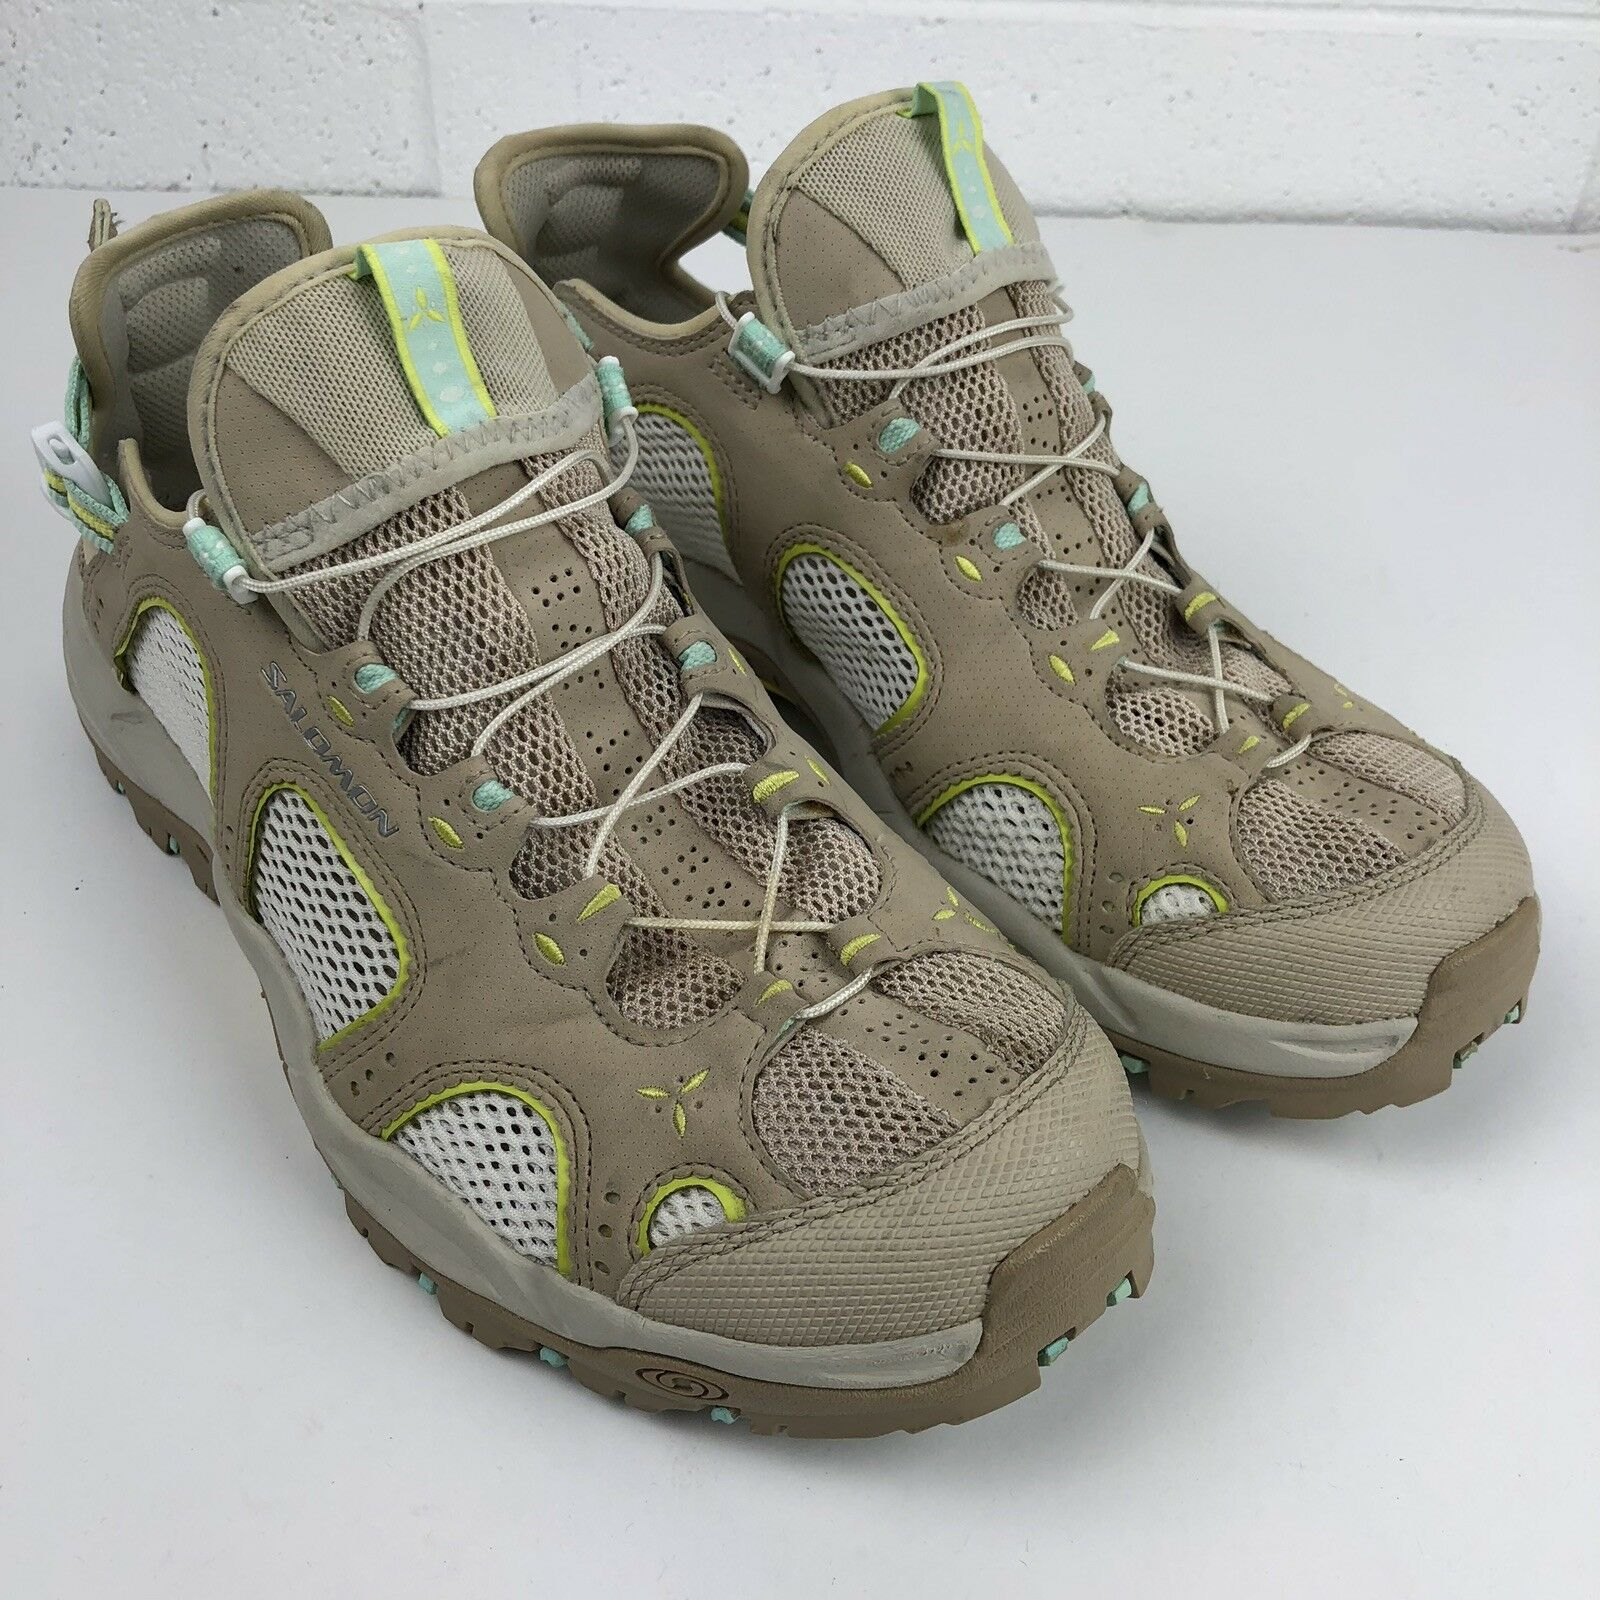 Salomon Techamphibian 3 Women's Size 9 Graphic Hike water trail shoes EUC